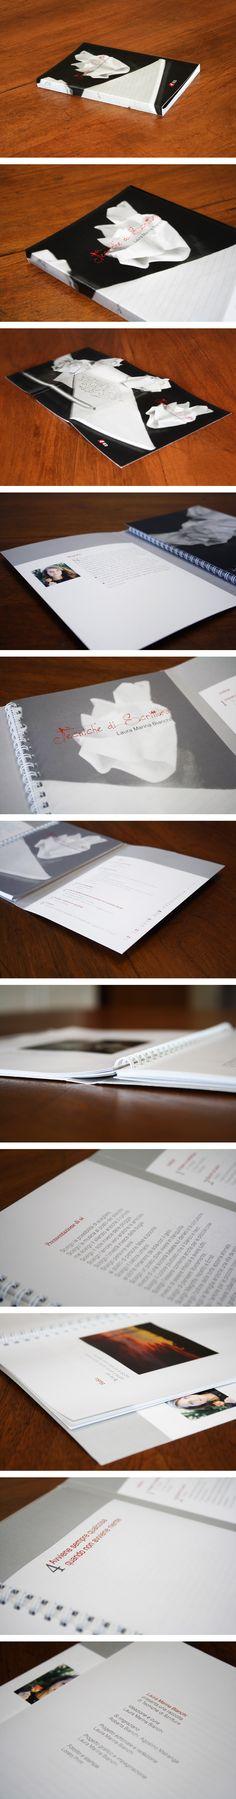 BOOK - Tecniche di scrittura impaginazione - raccolta - poesie - haiku - print design - libro - indice - graphic design